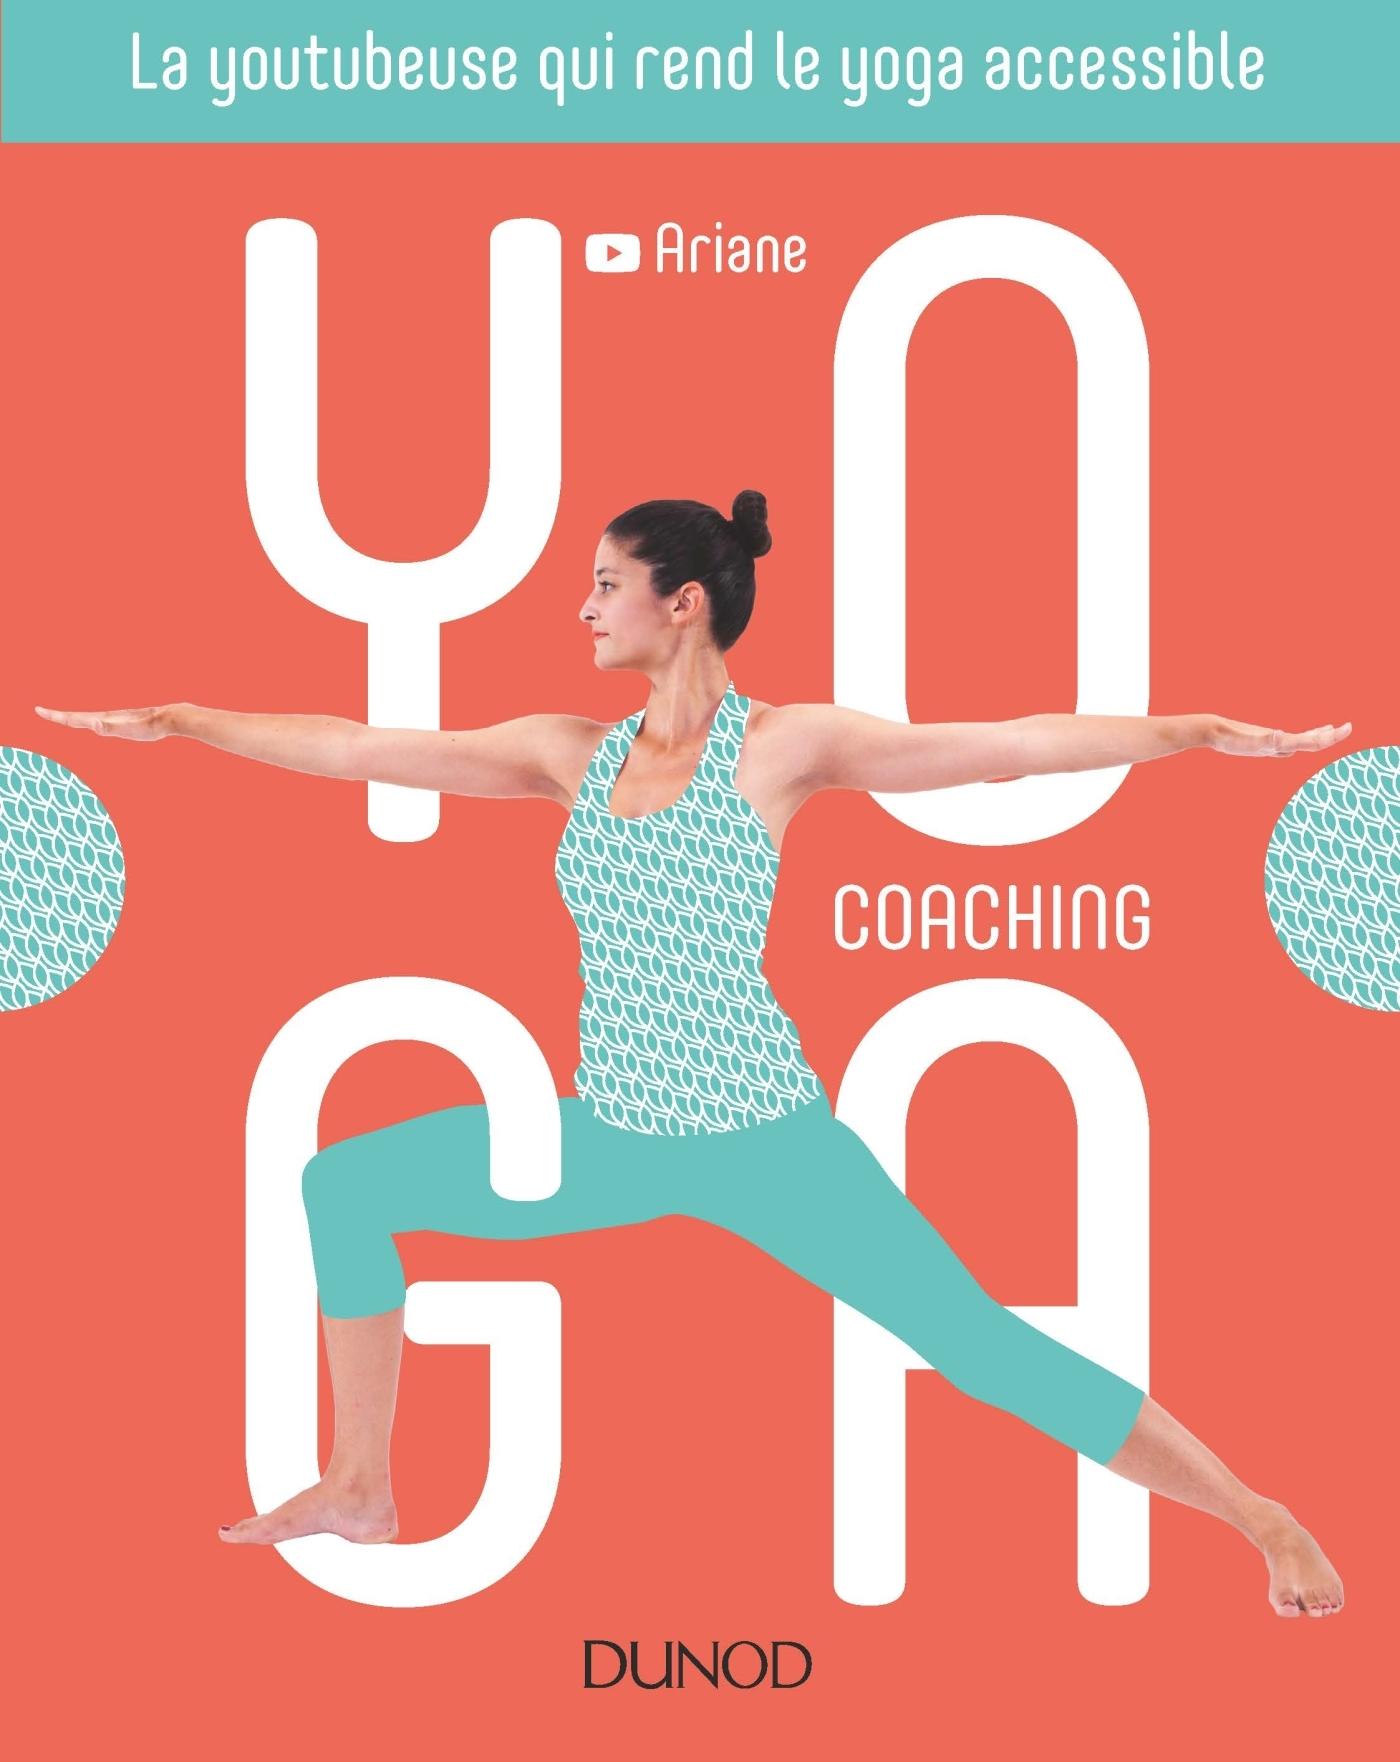 YOGA COACHING - LA YOUTUBEUSE QUI REND LE YOGA ACCESSIBLE